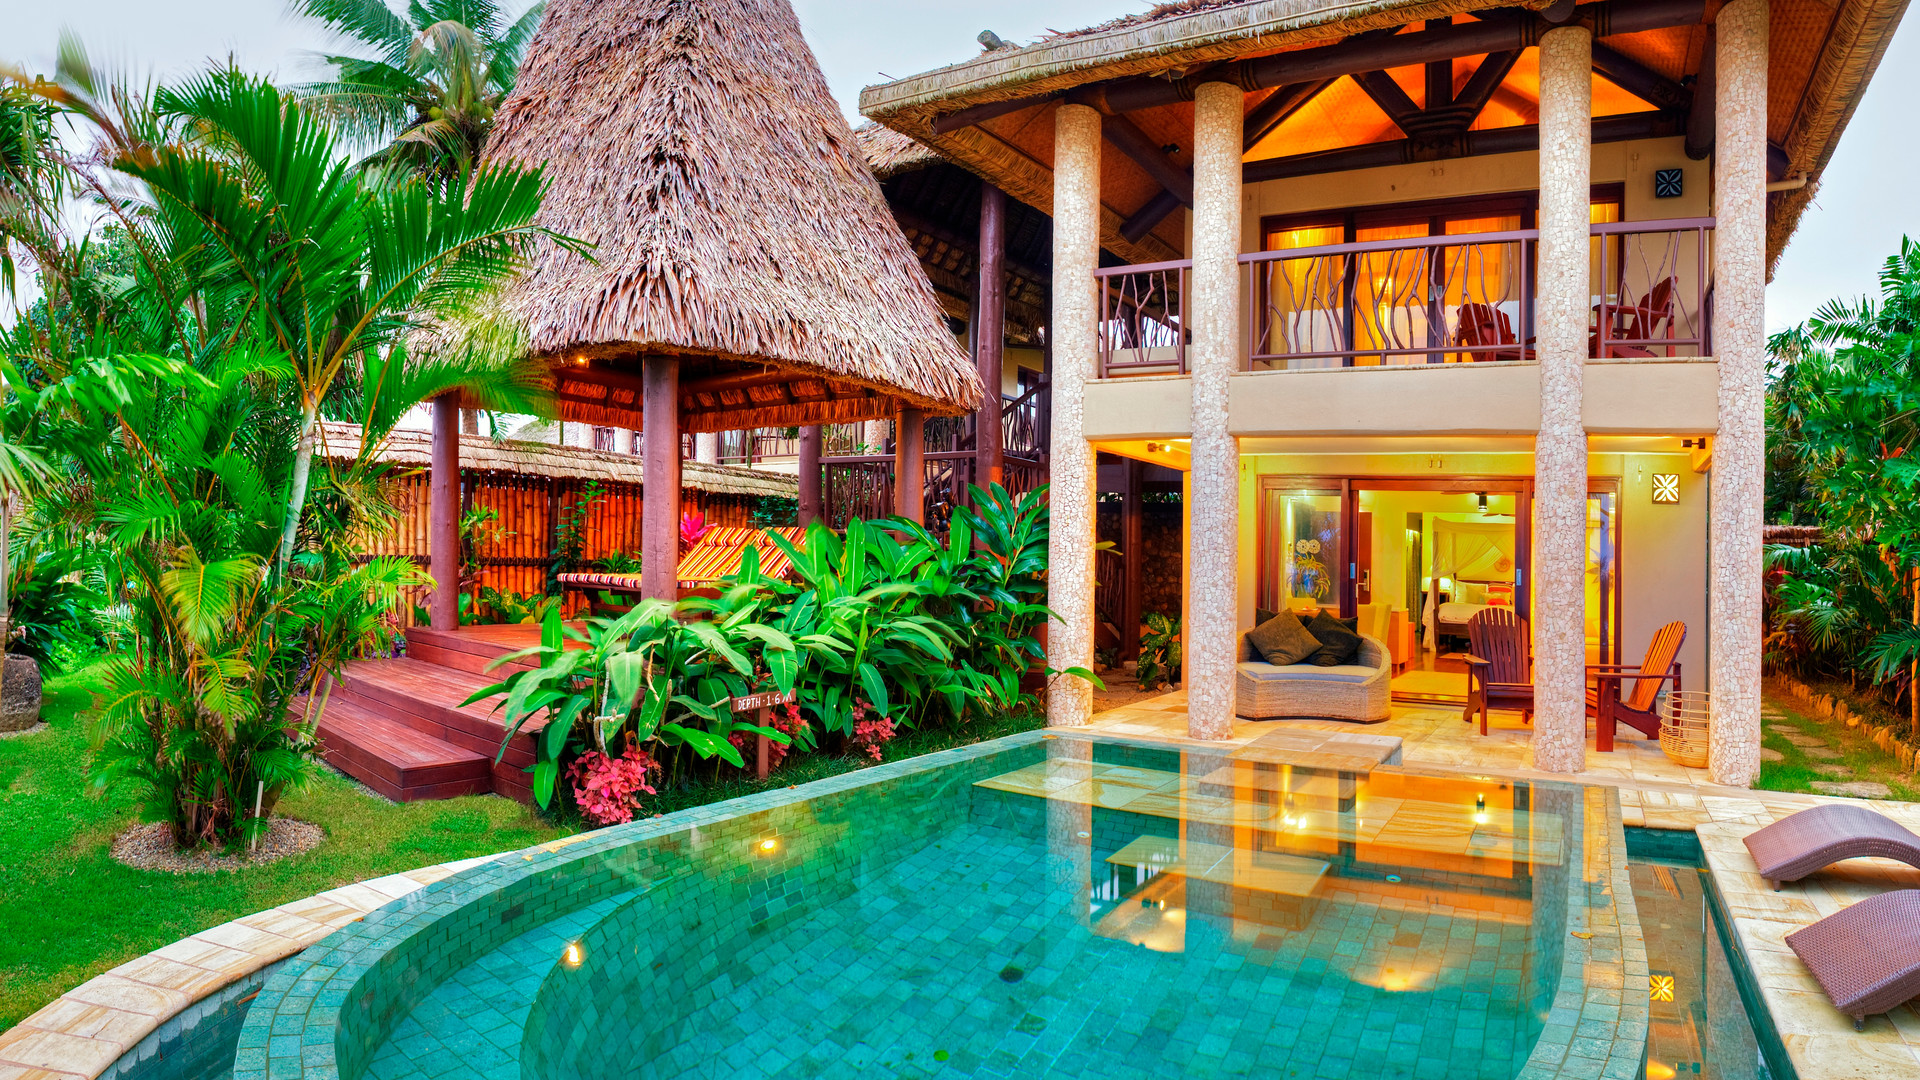 Nanaku_Auberge_Resort-Pool_Villa_with_Bure